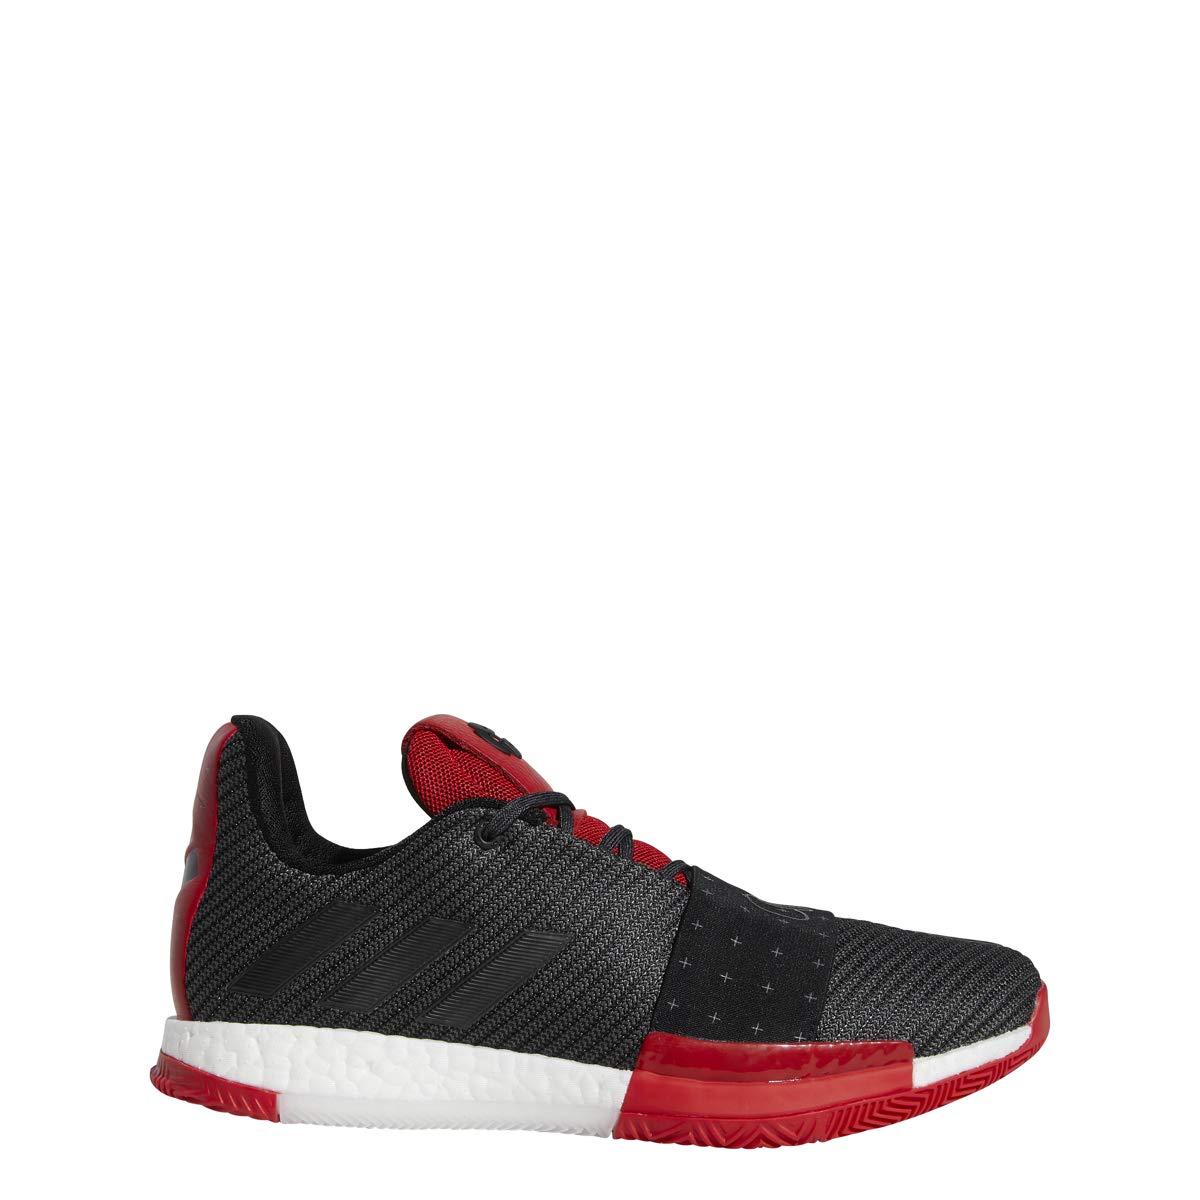 Image of adidas Harden Vol. 3 Shoe - Men's Basketball Core Black/Grey/Scarlet Basketball